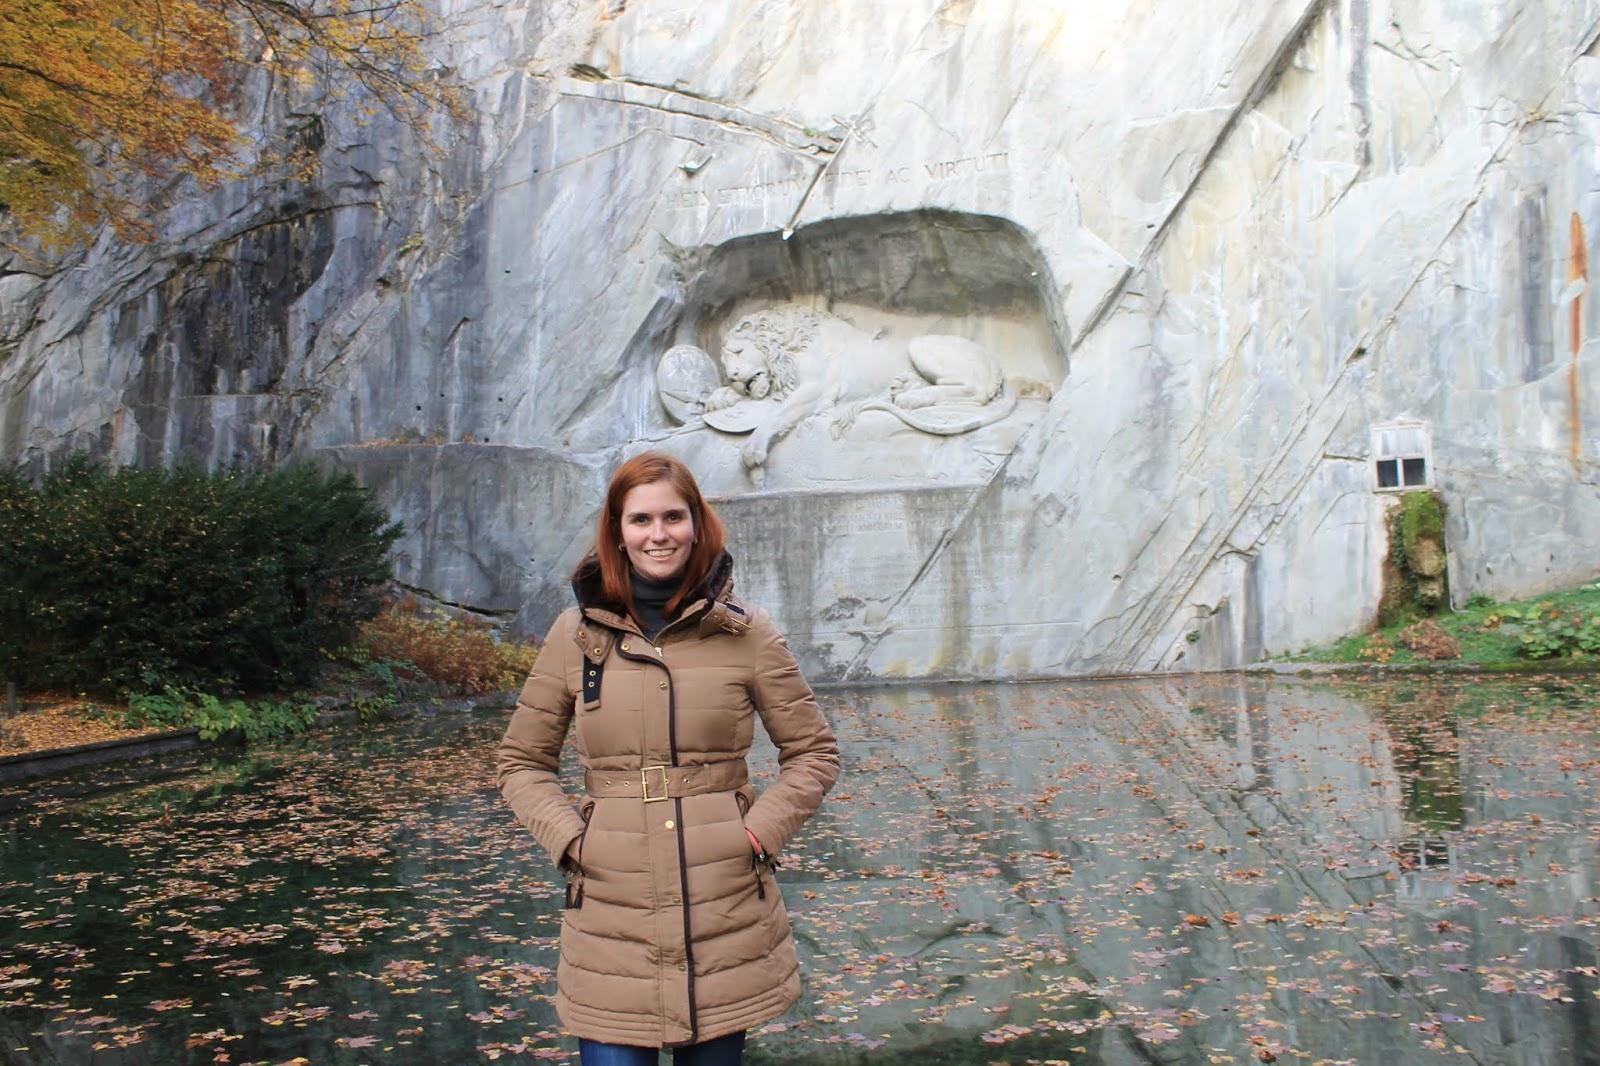 Löwendenkmal ou Monumento do Leão - Luzern